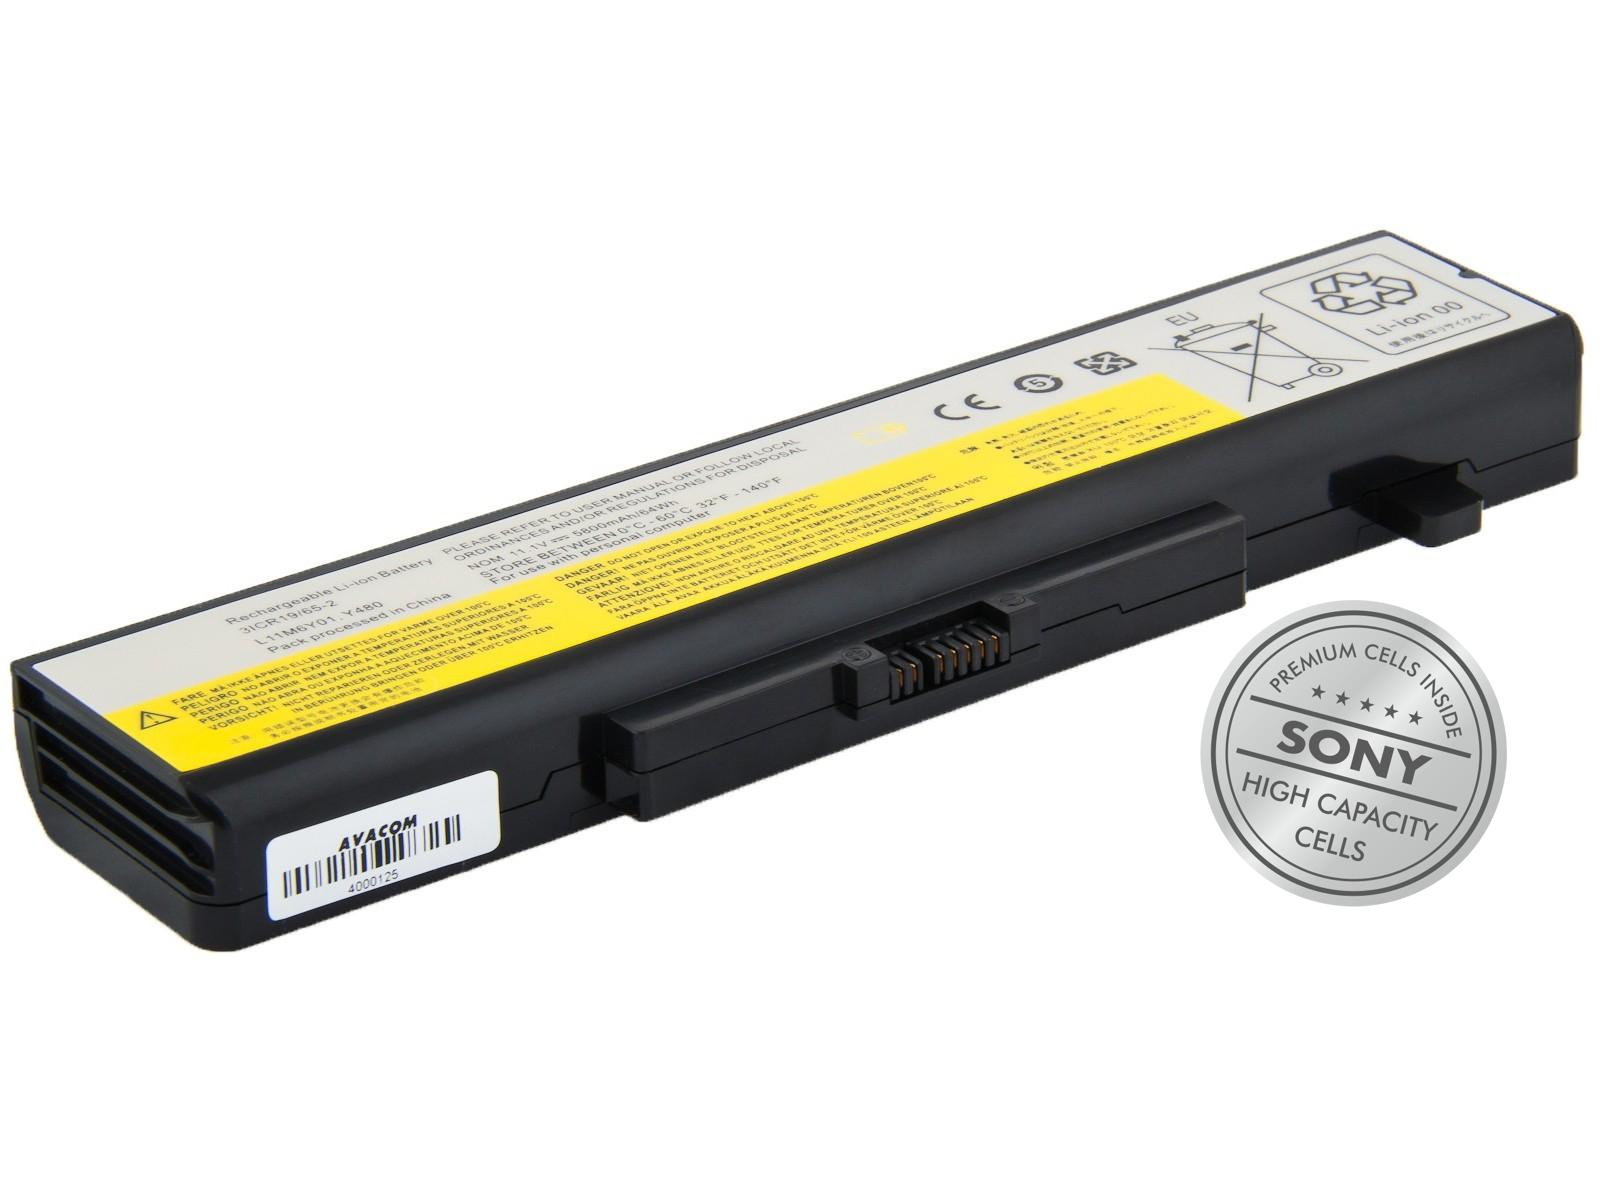 Baterie AVACOM NOLE-E430-S29 pro Lenovo ThinkPad E430, E530 Li-Ion 11,1V 5800mAh/64Wh